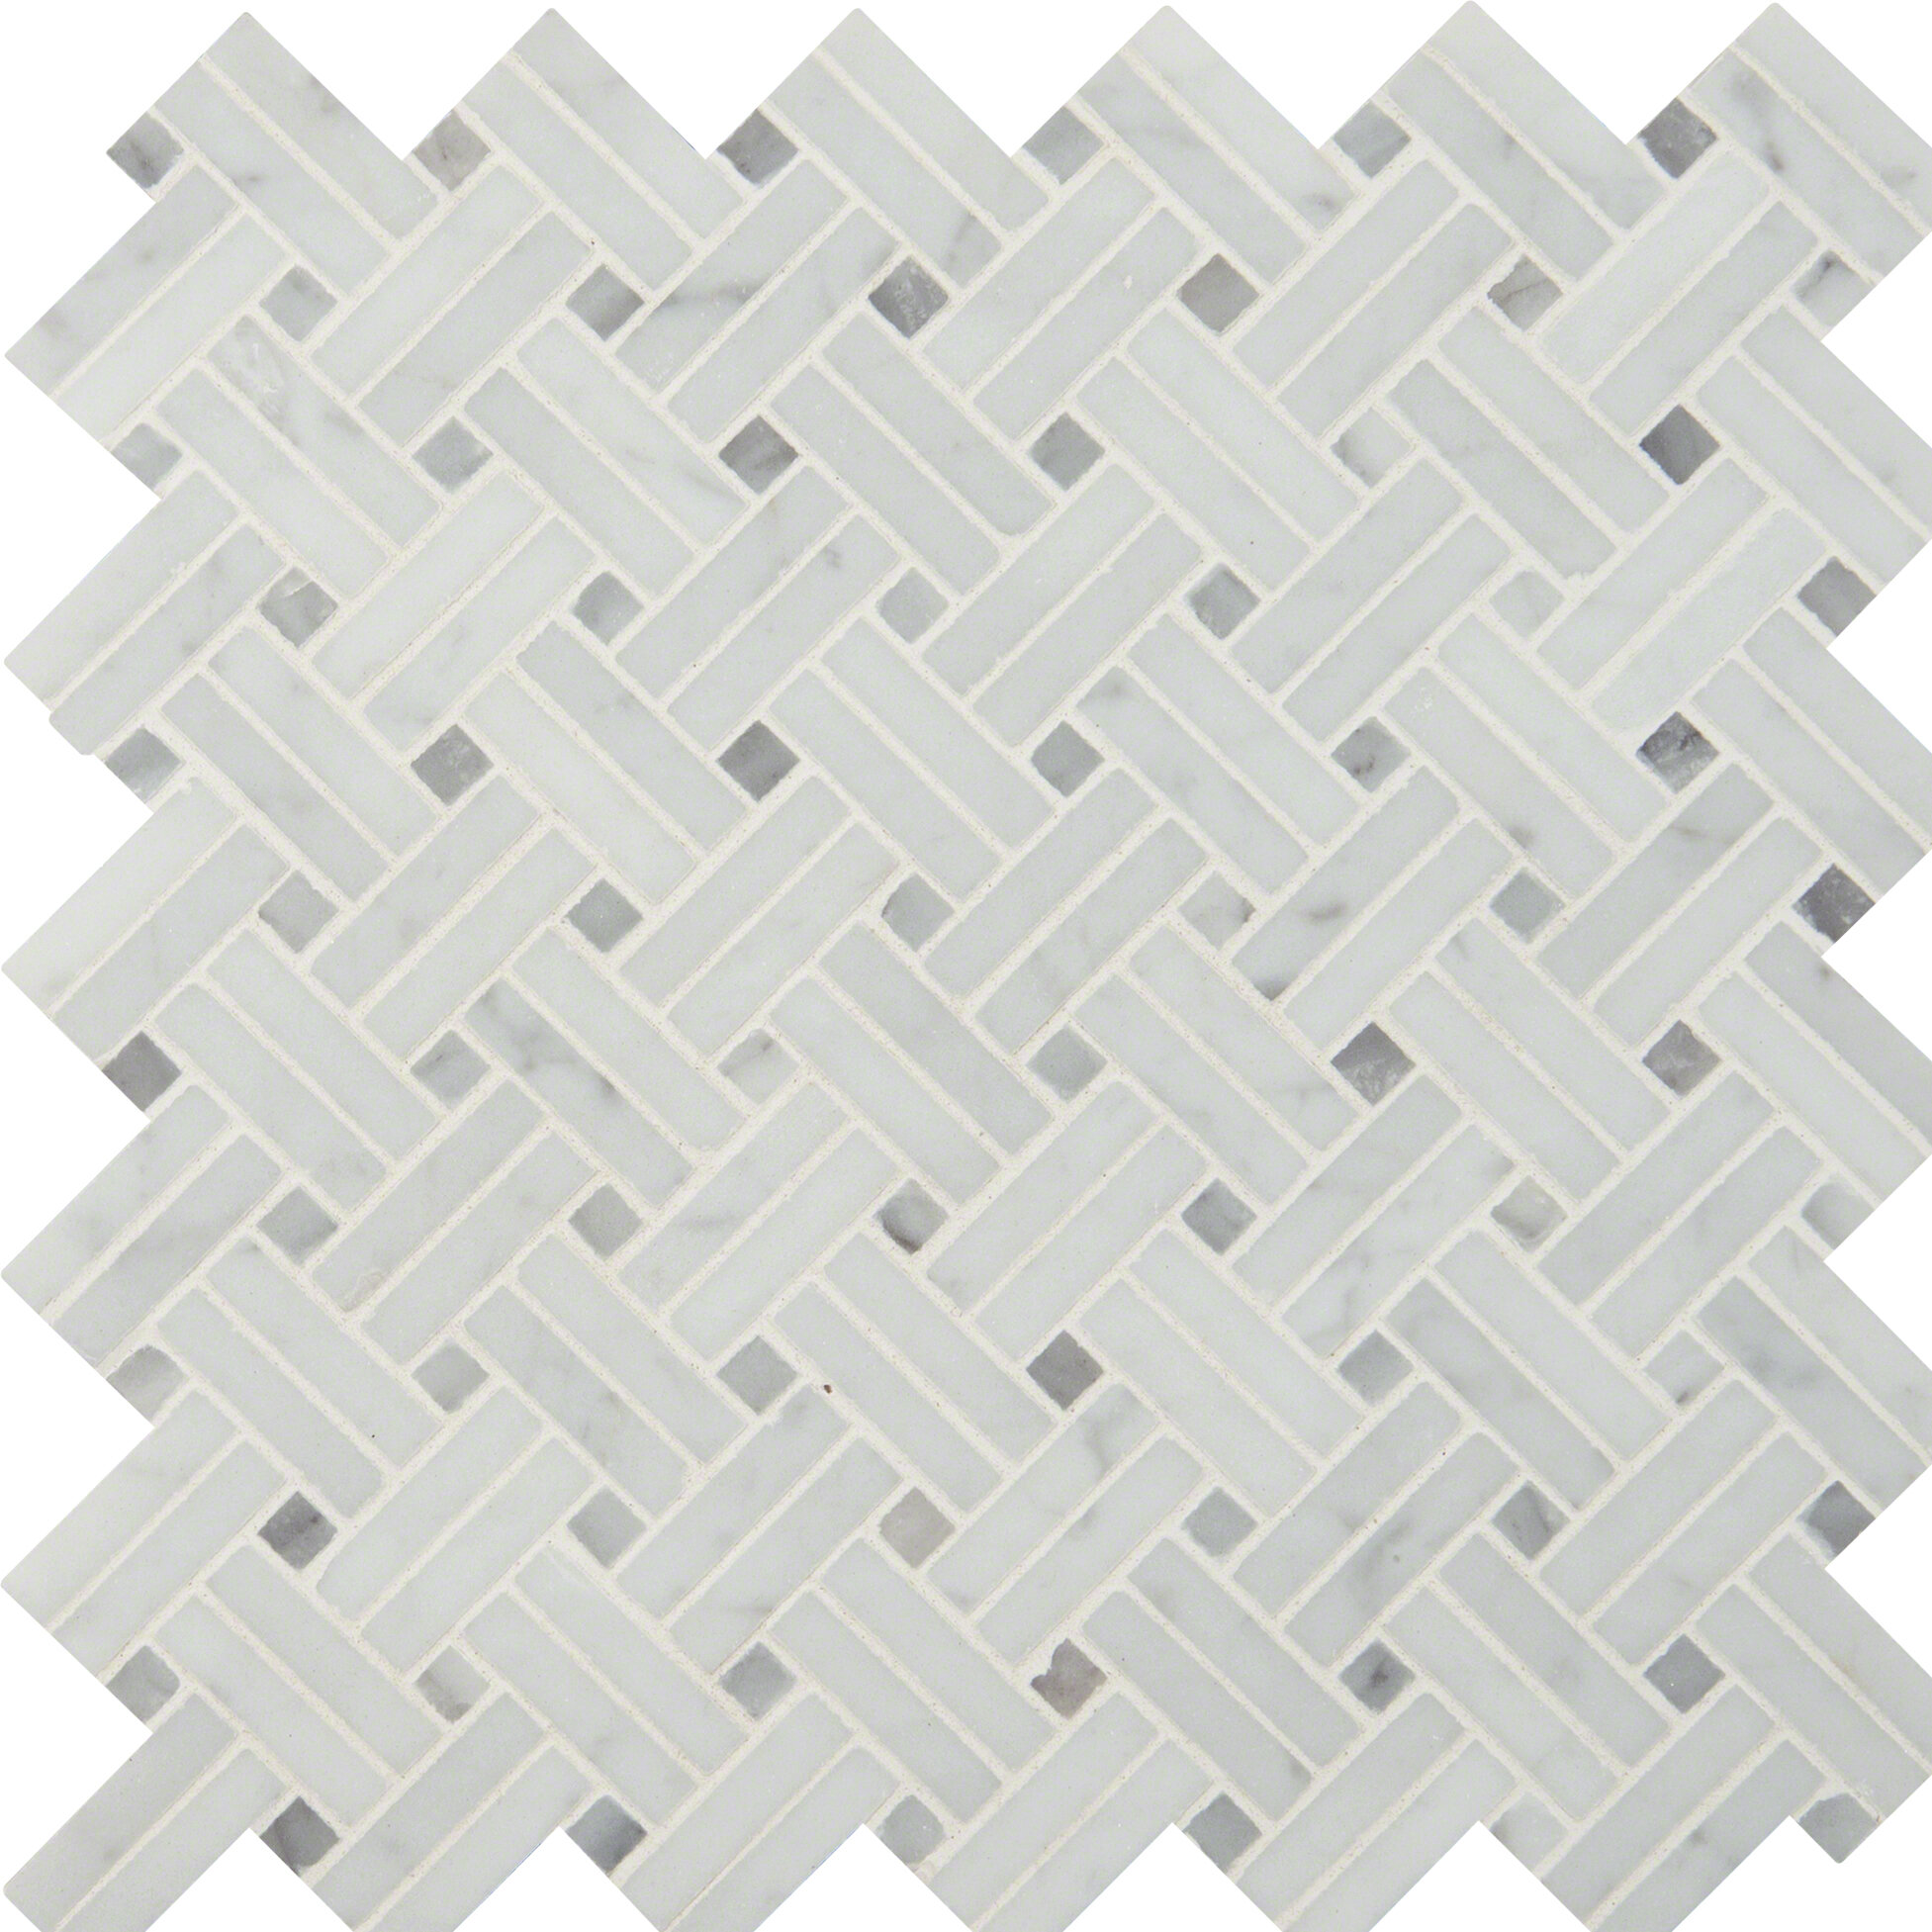 MSI Basketweave Polished Marble Mosaic Tile in White | Wayfair